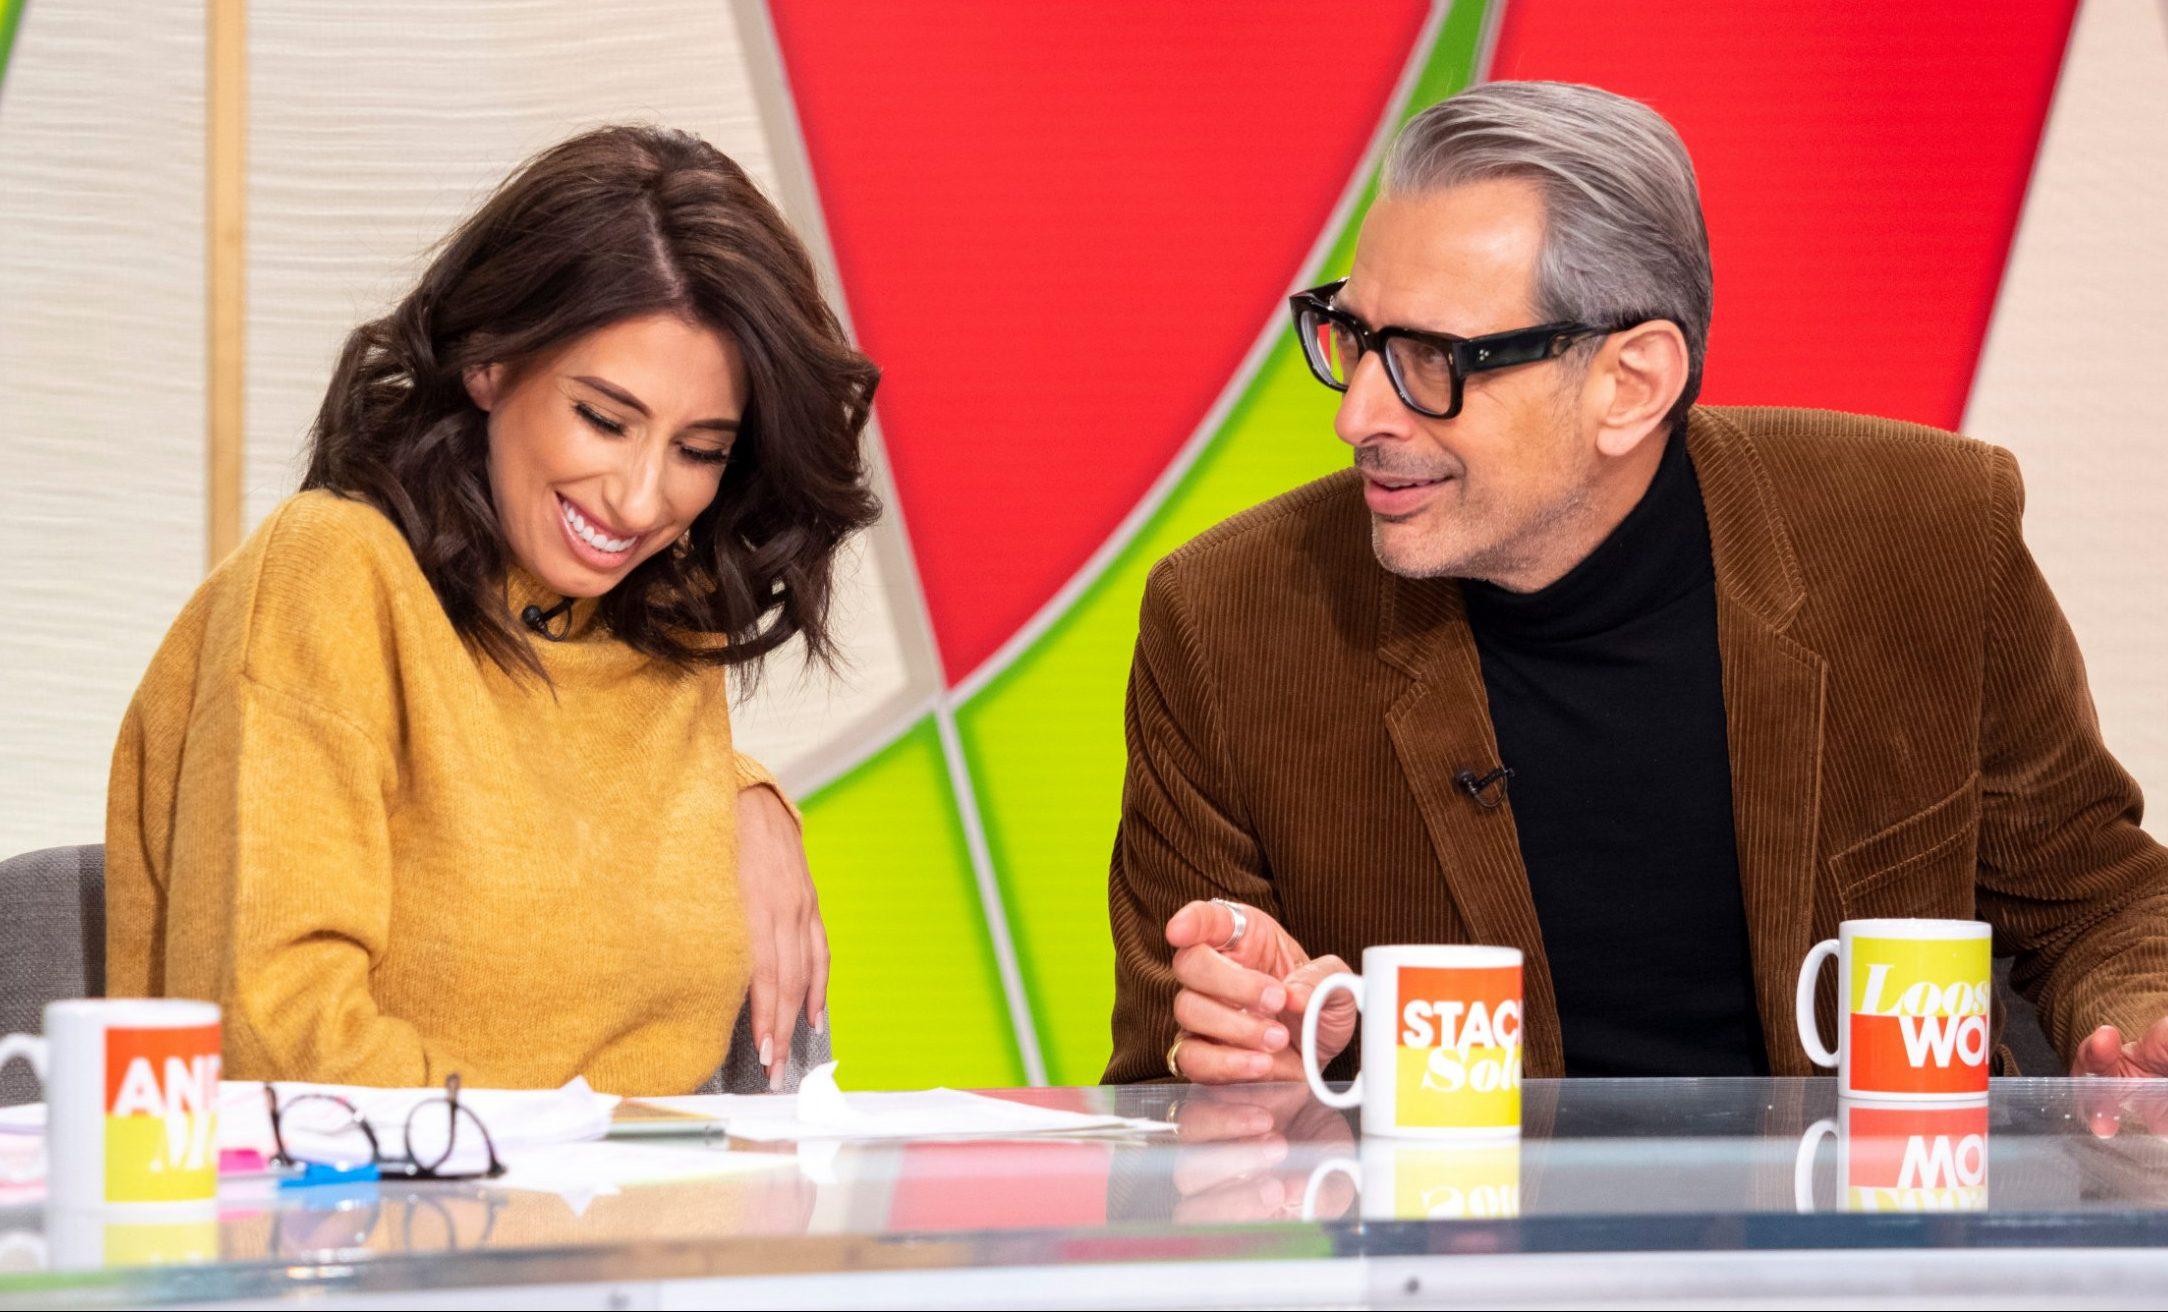 Stacey Solomon jokes about masturbation with Jeff Goldblum in rude TV interview